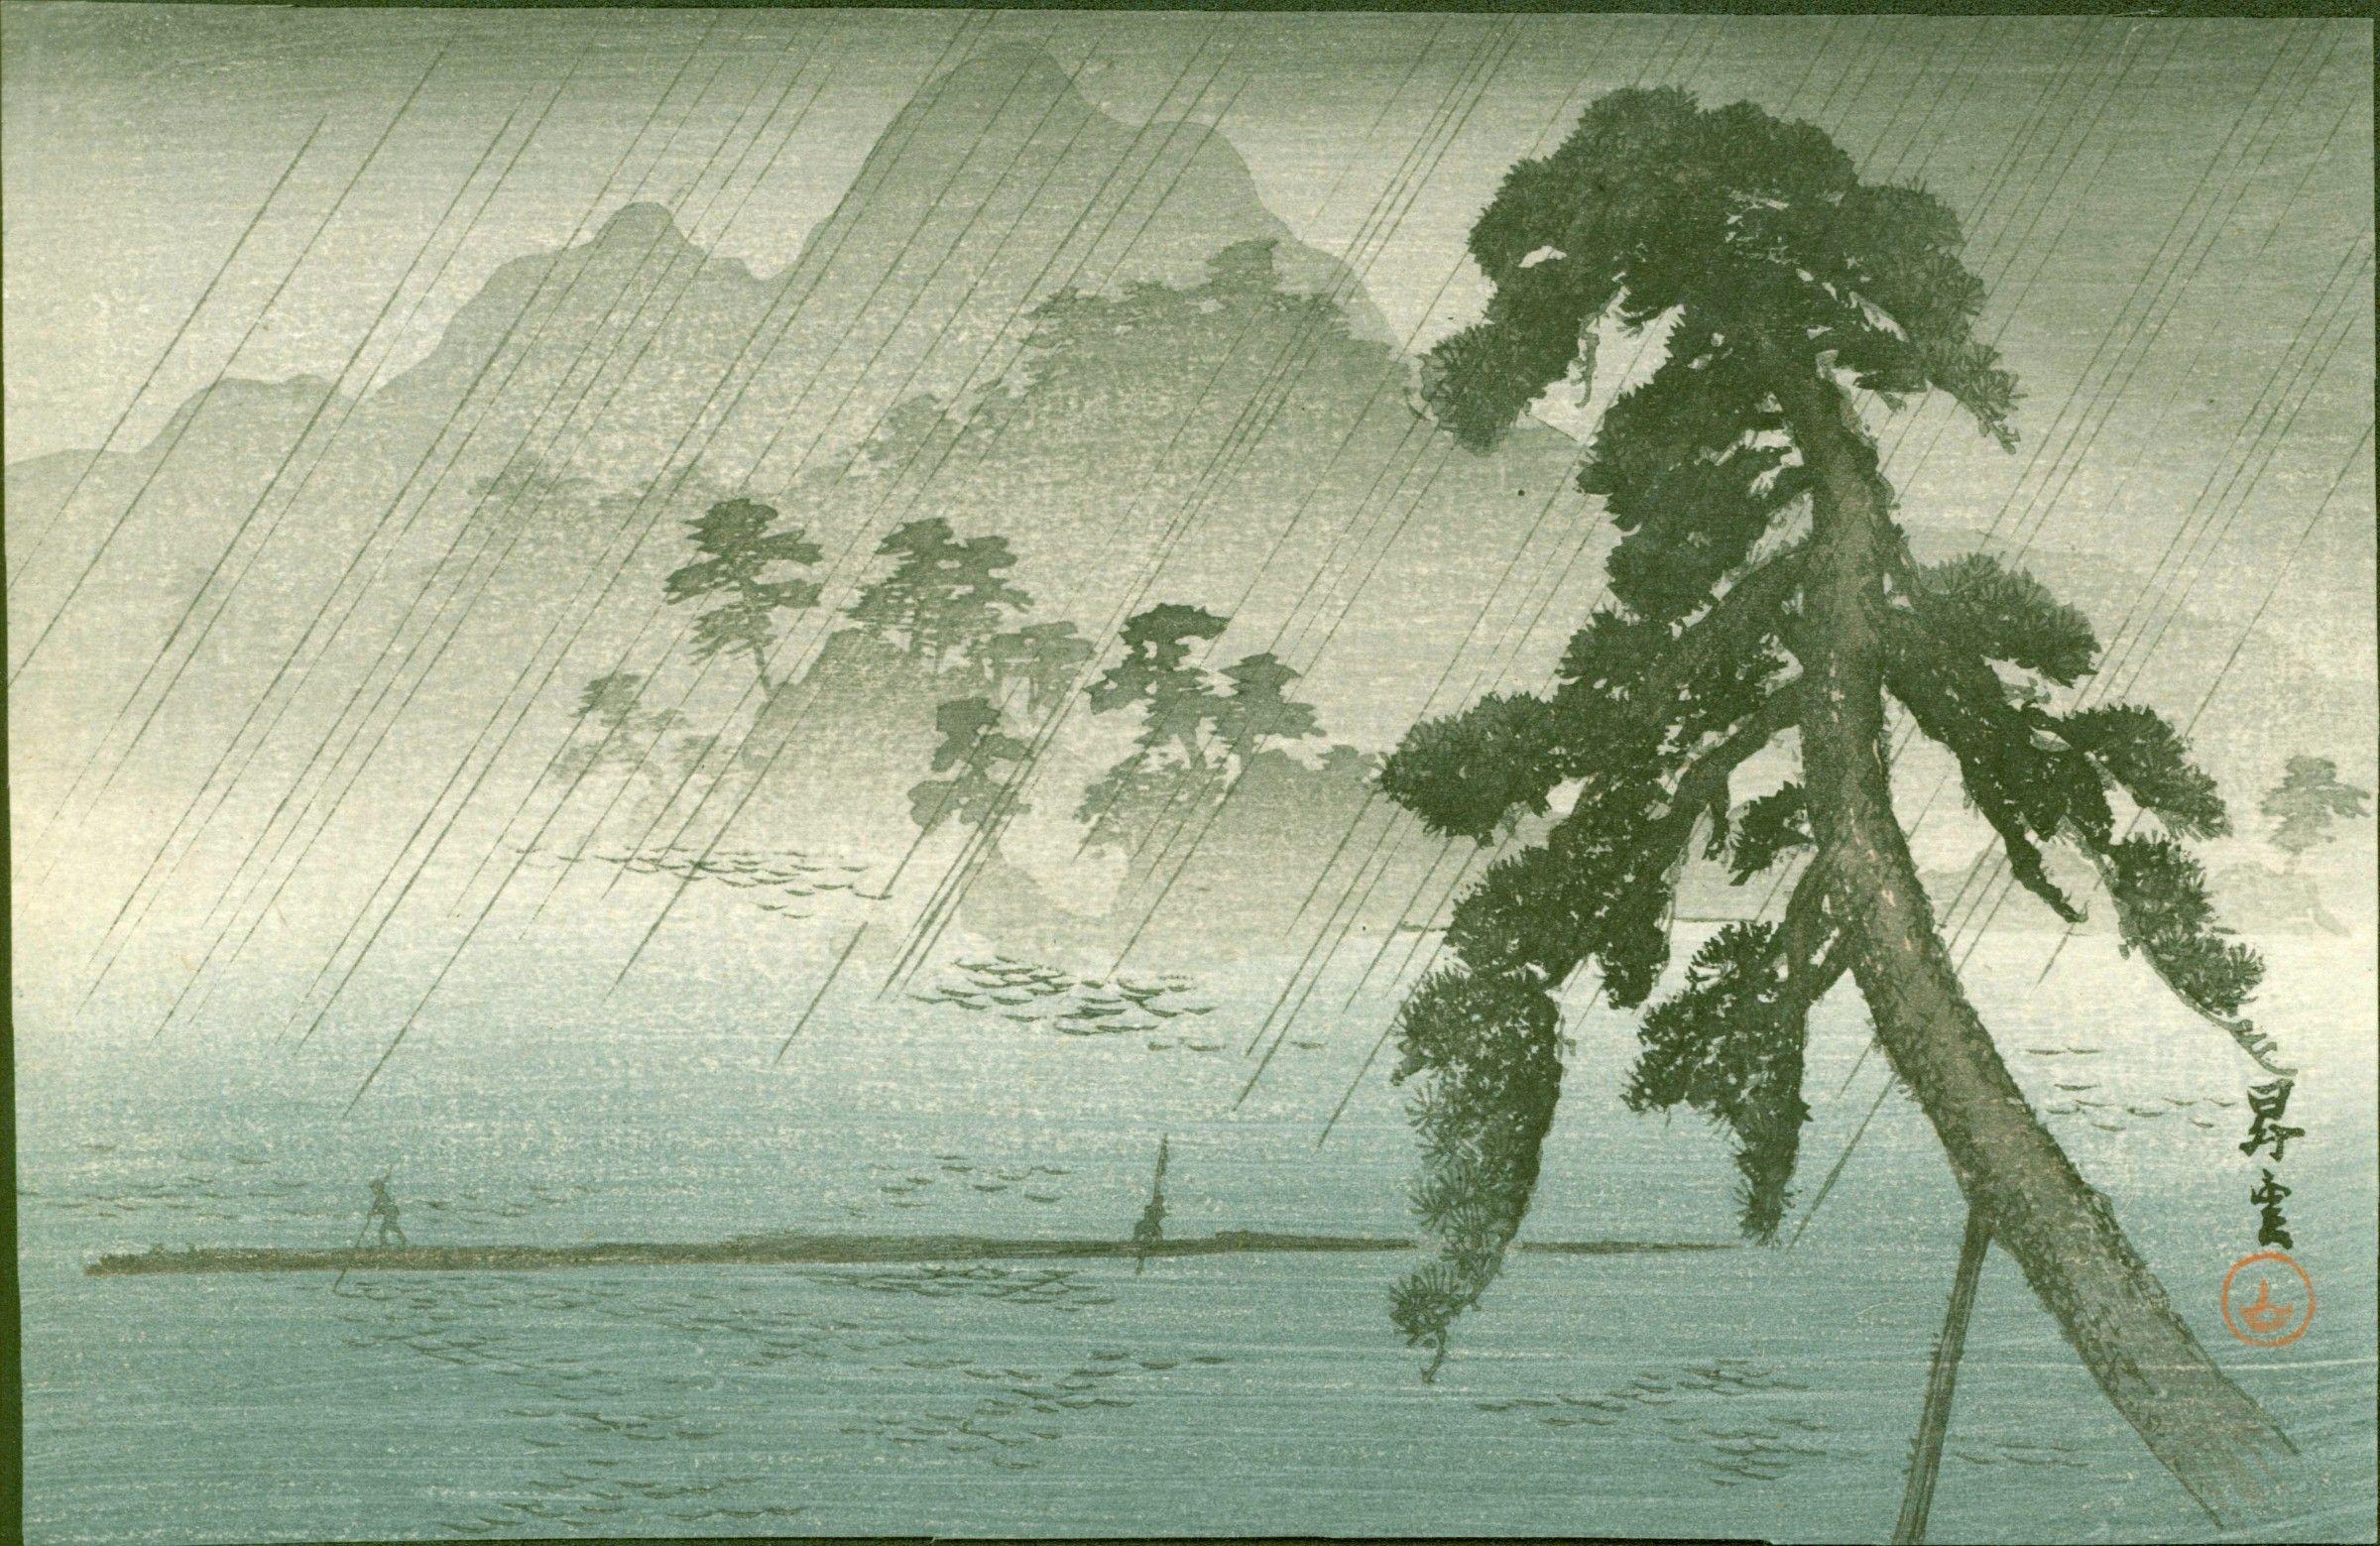 Yamamoto Shoun Japanese Woodblock Print - Rain on a Lake - 1910